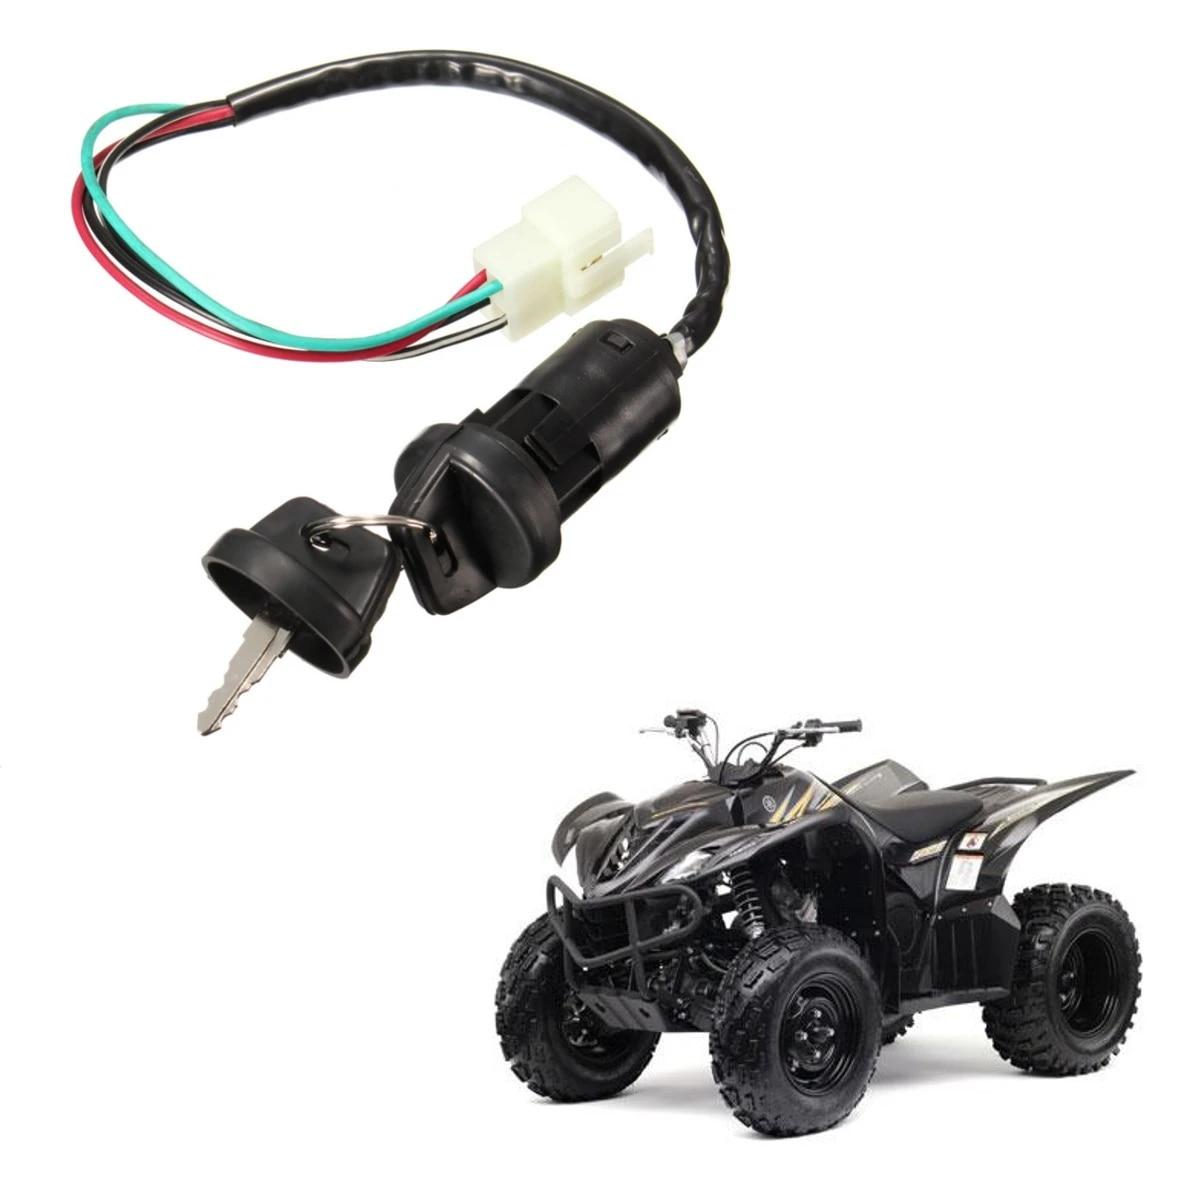 Universal Ignition Barrel Key Switch ATV Pit Bike Dirt Bike Motorcycle new~